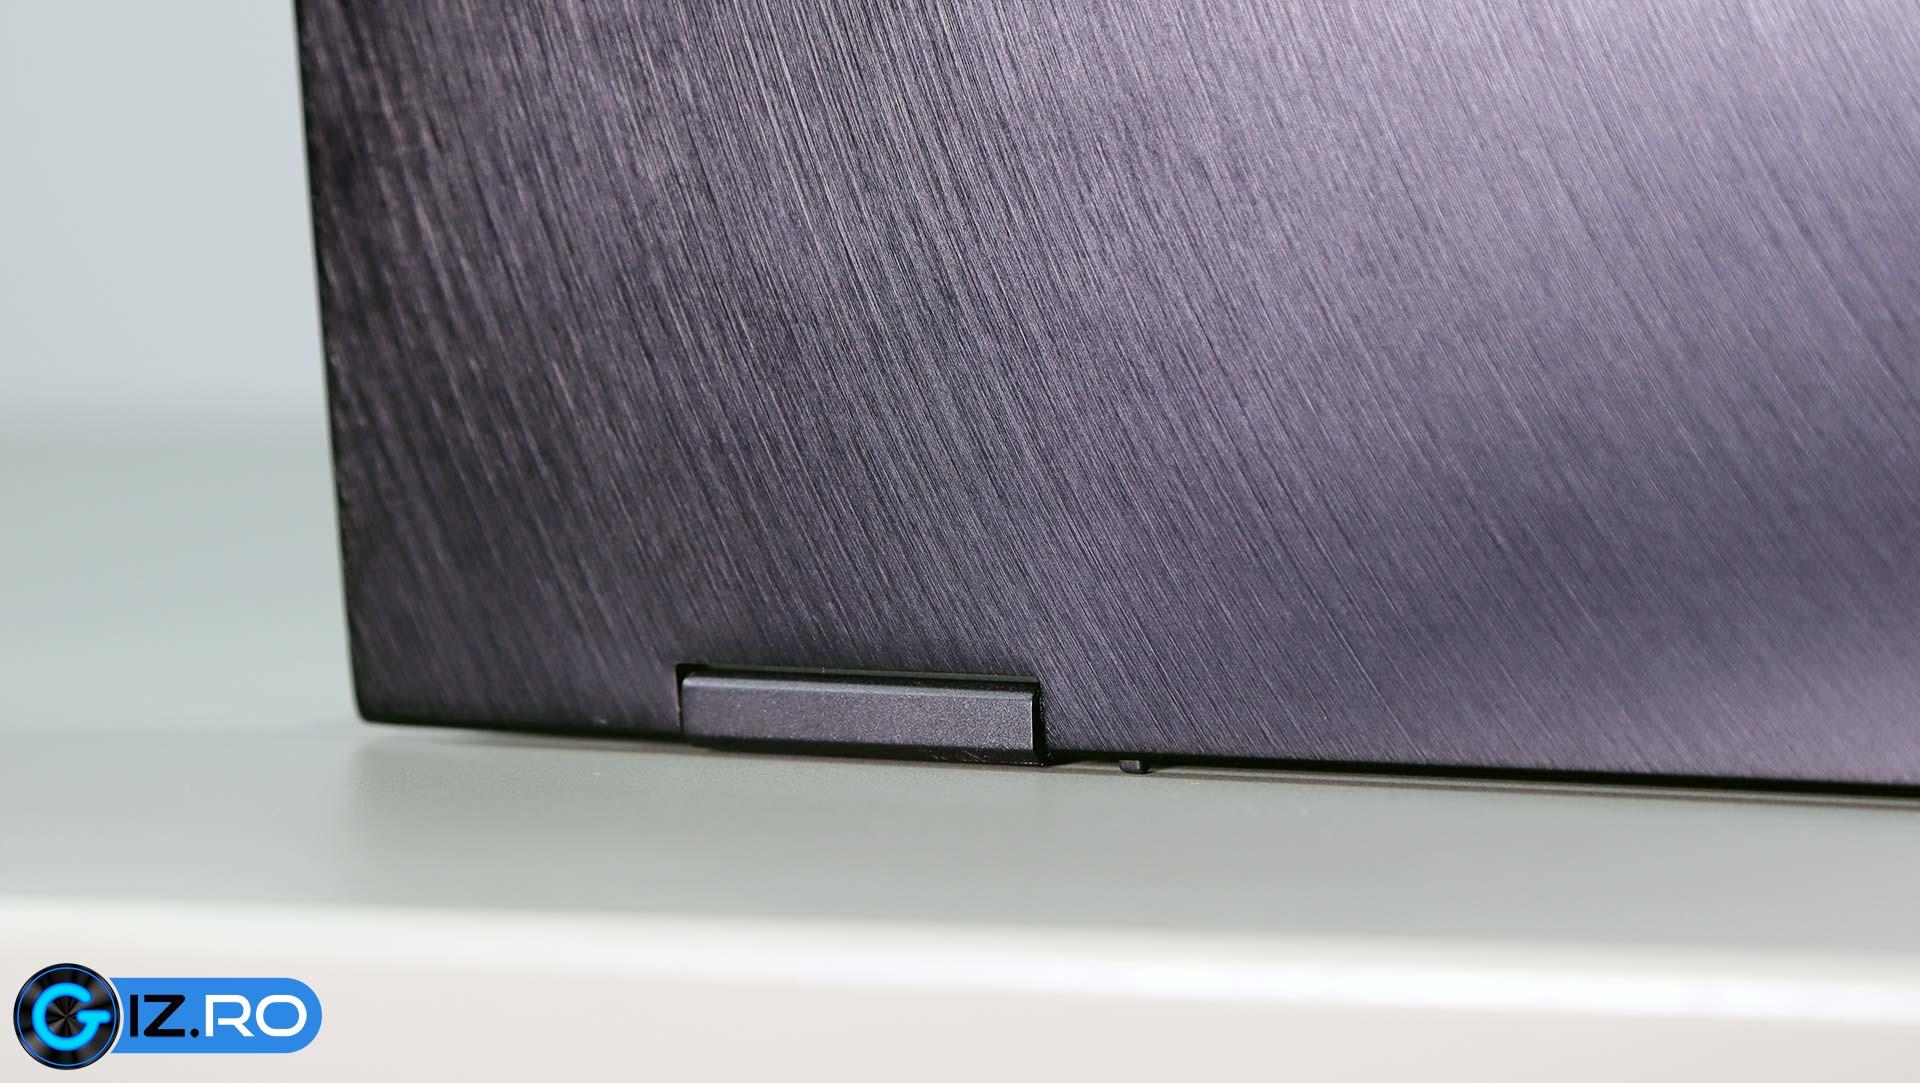 asus-zenbook-ux371-minuscule-rubber-feet